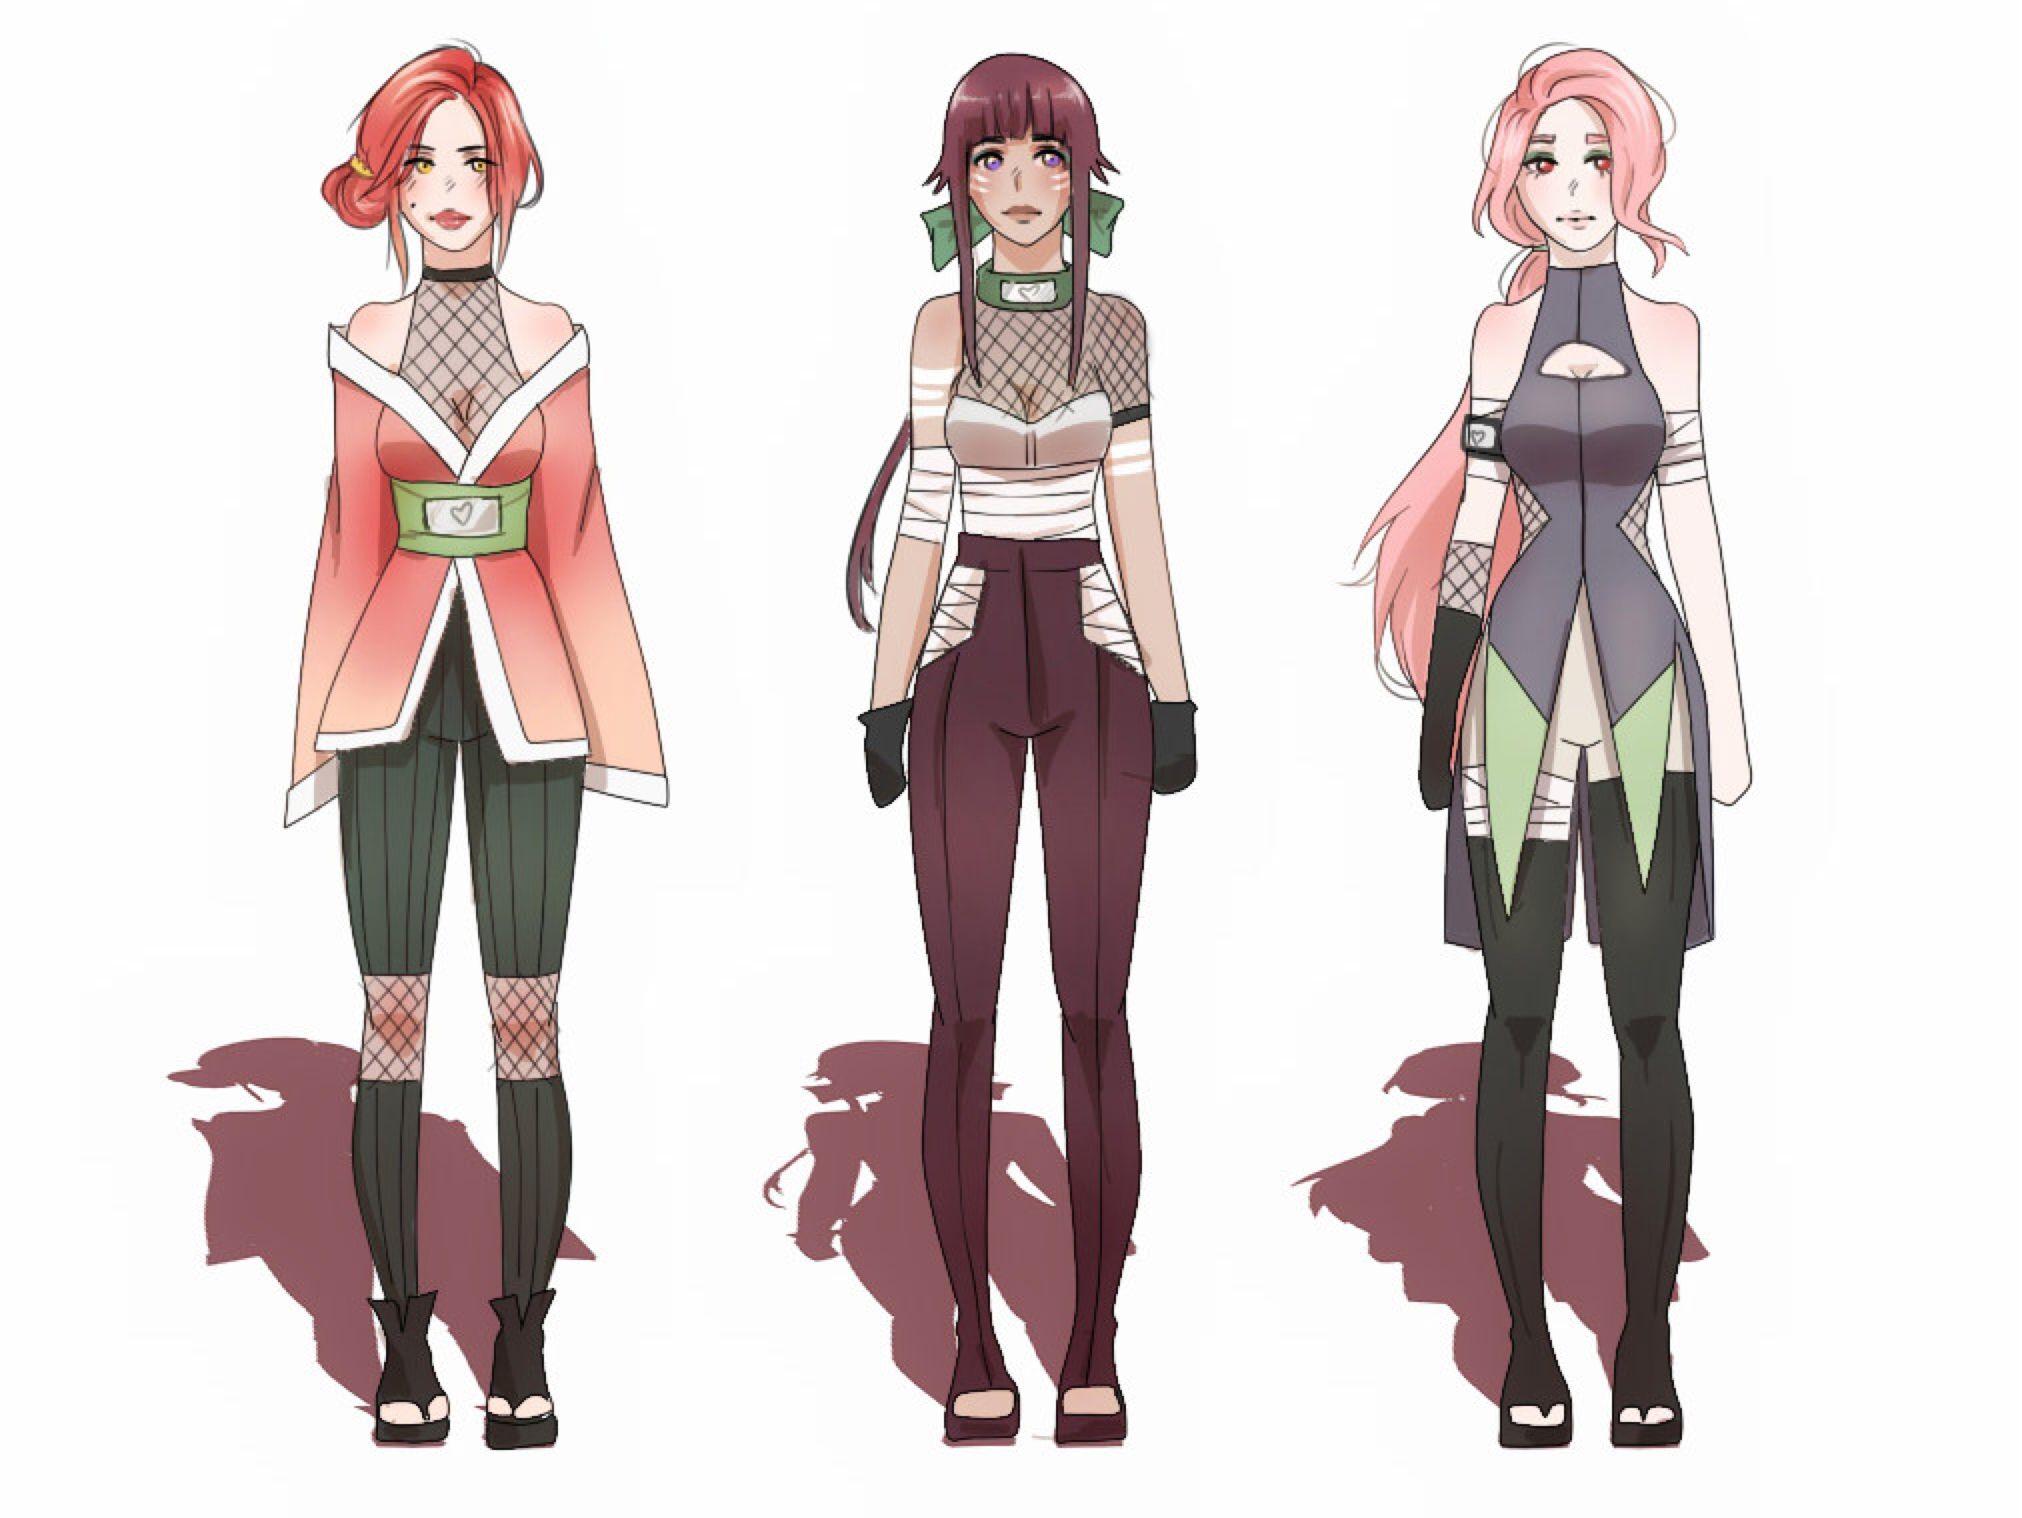 Naruto Adoptables 2 By Szyszke On Deviantart Naruto Anime Ninja Anime Characters